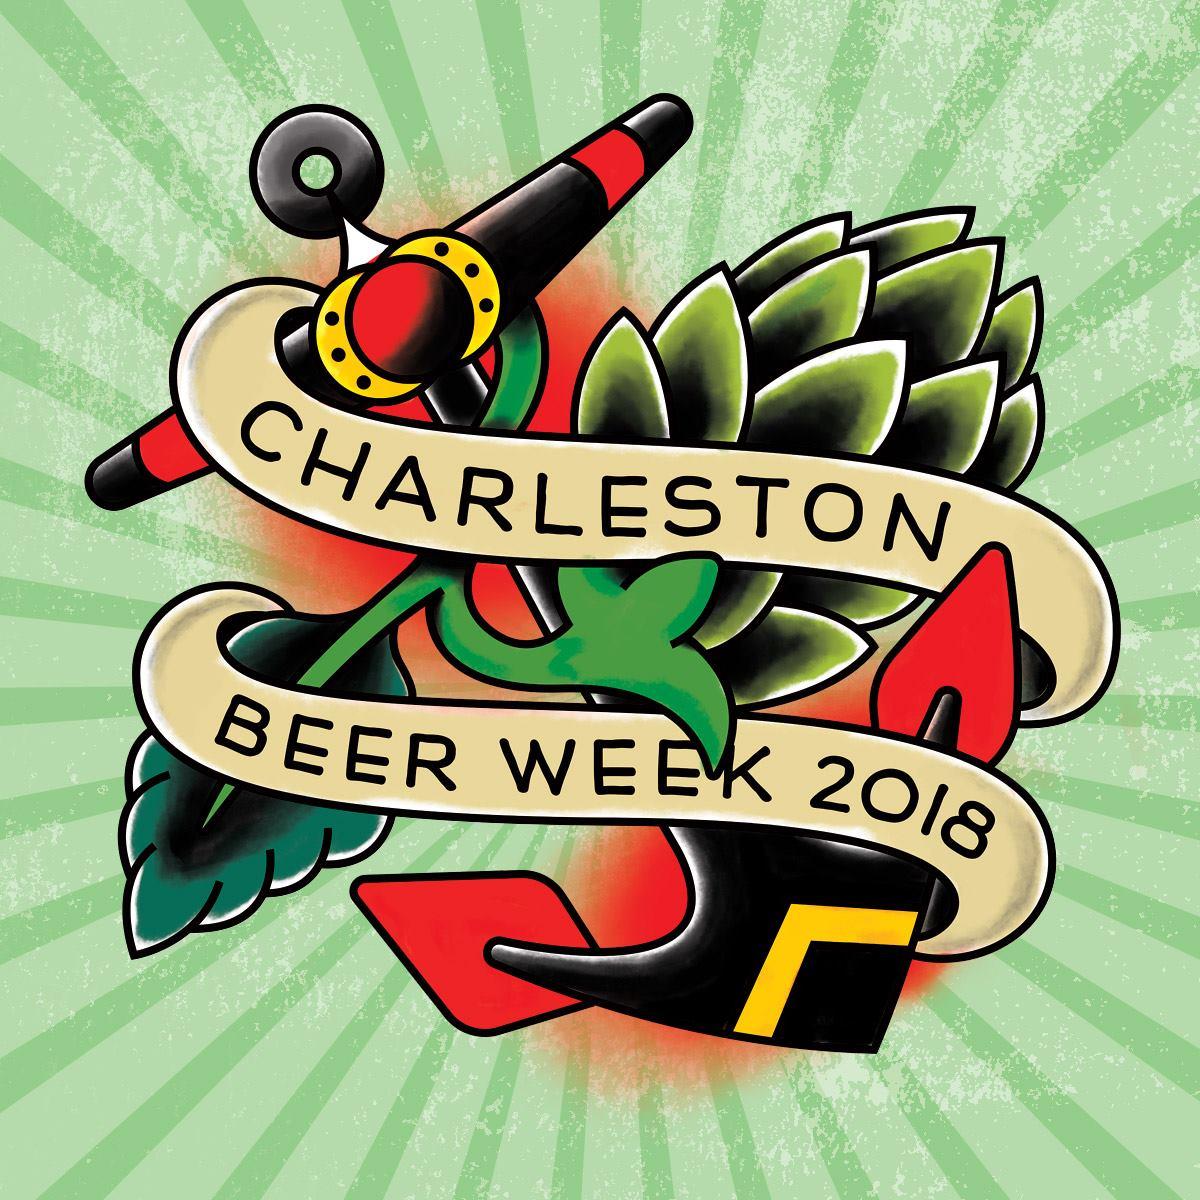 Charleston Beer Week Logo with Green Burst Background